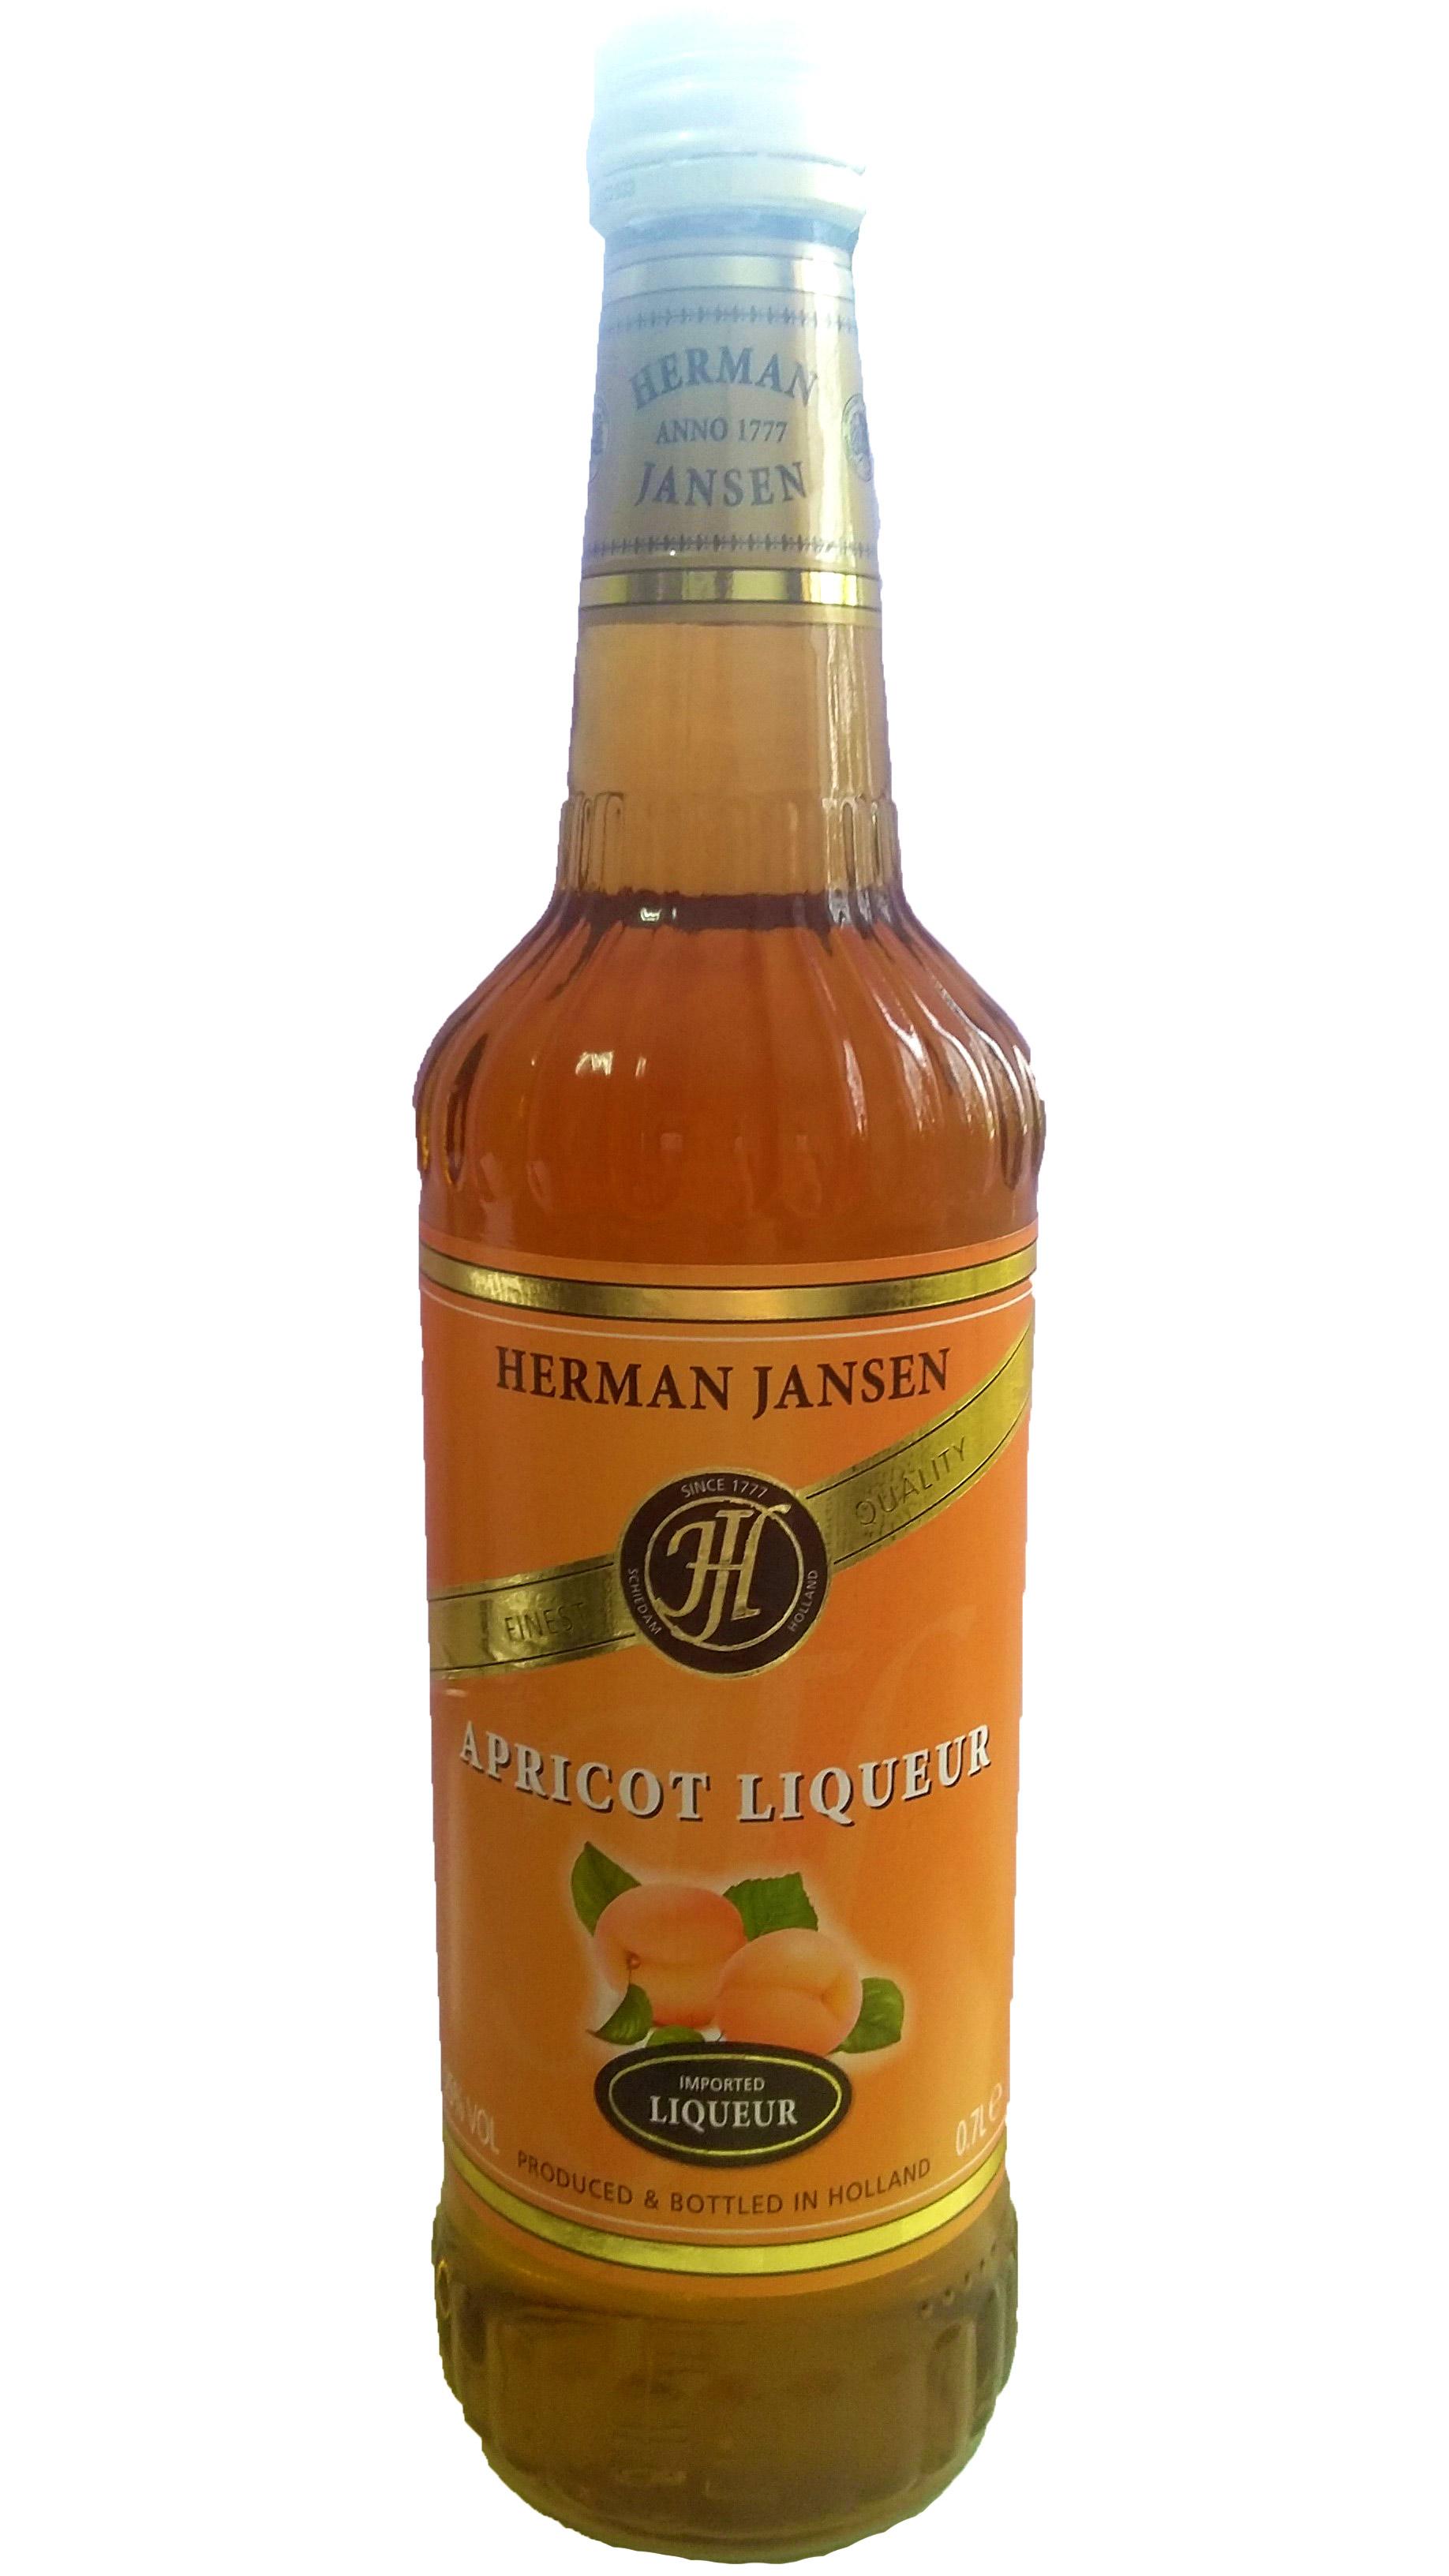 Herman Jansen Apricot Lichior 25% 0,7L